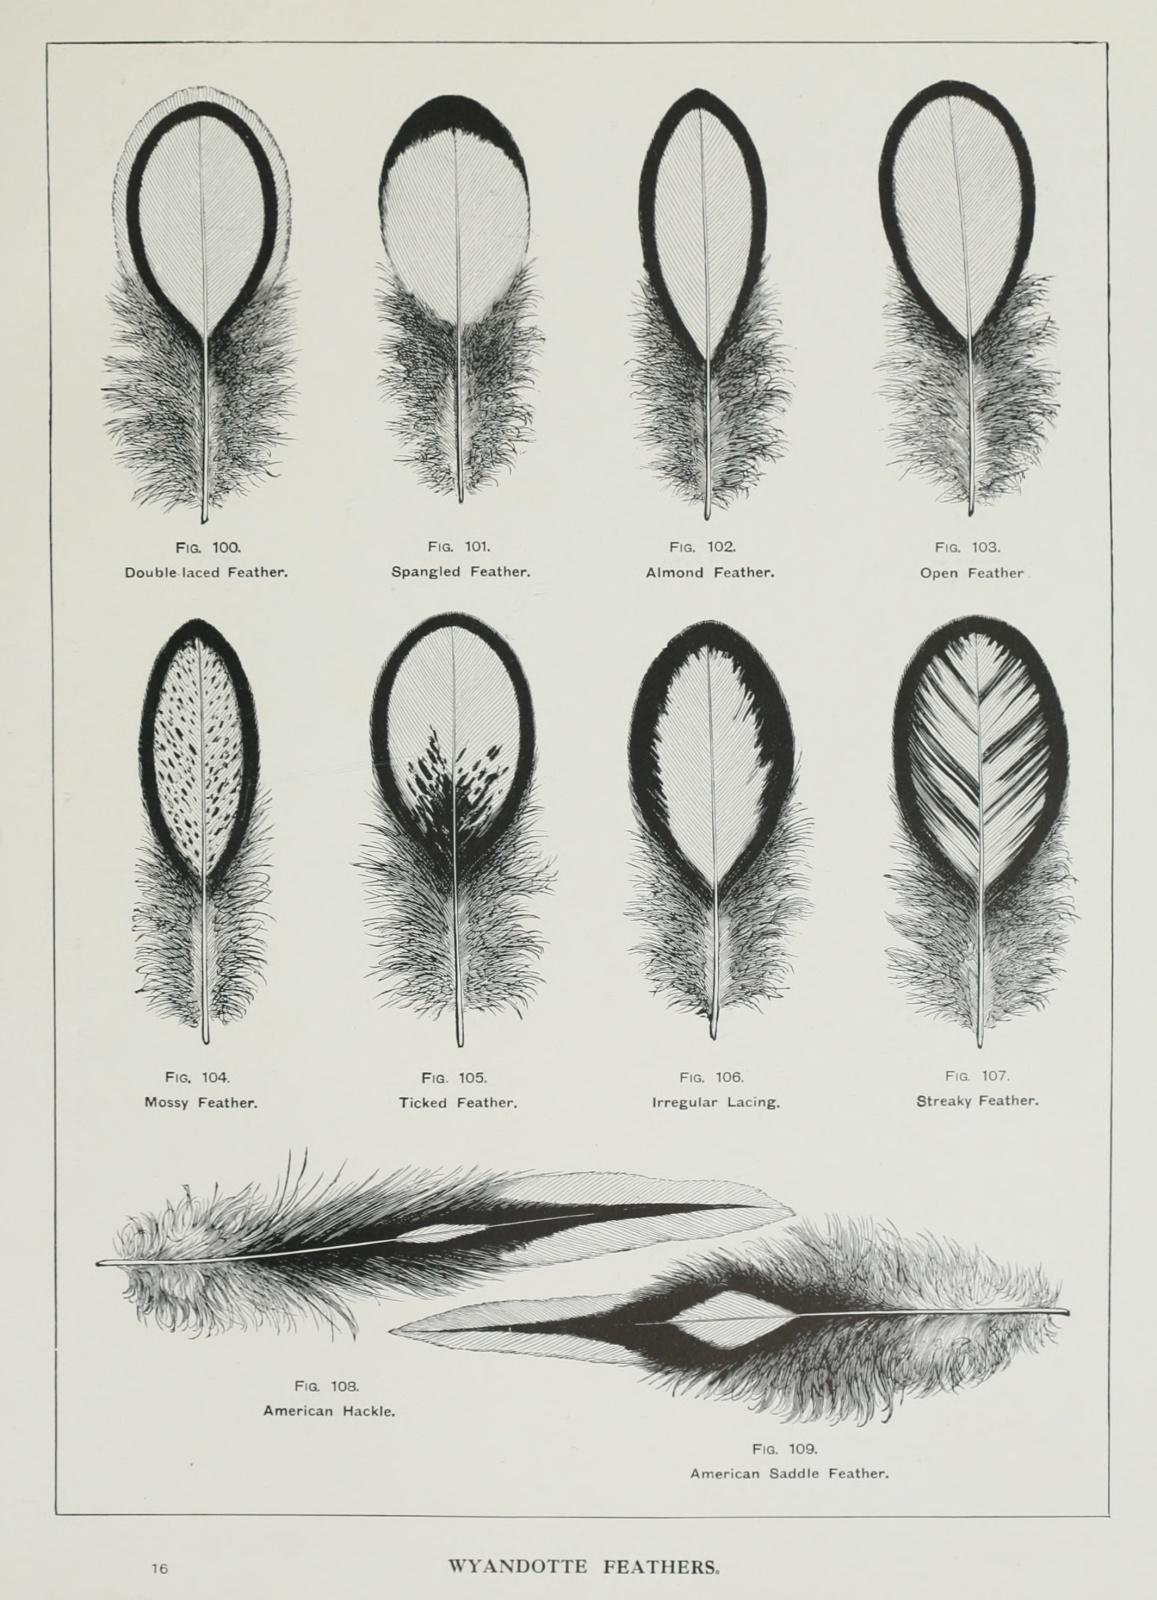 wrightsbookofpou00wrig orig 0399 wyandottes feathers. Black Bedroom Furniture Sets. Home Design Ideas